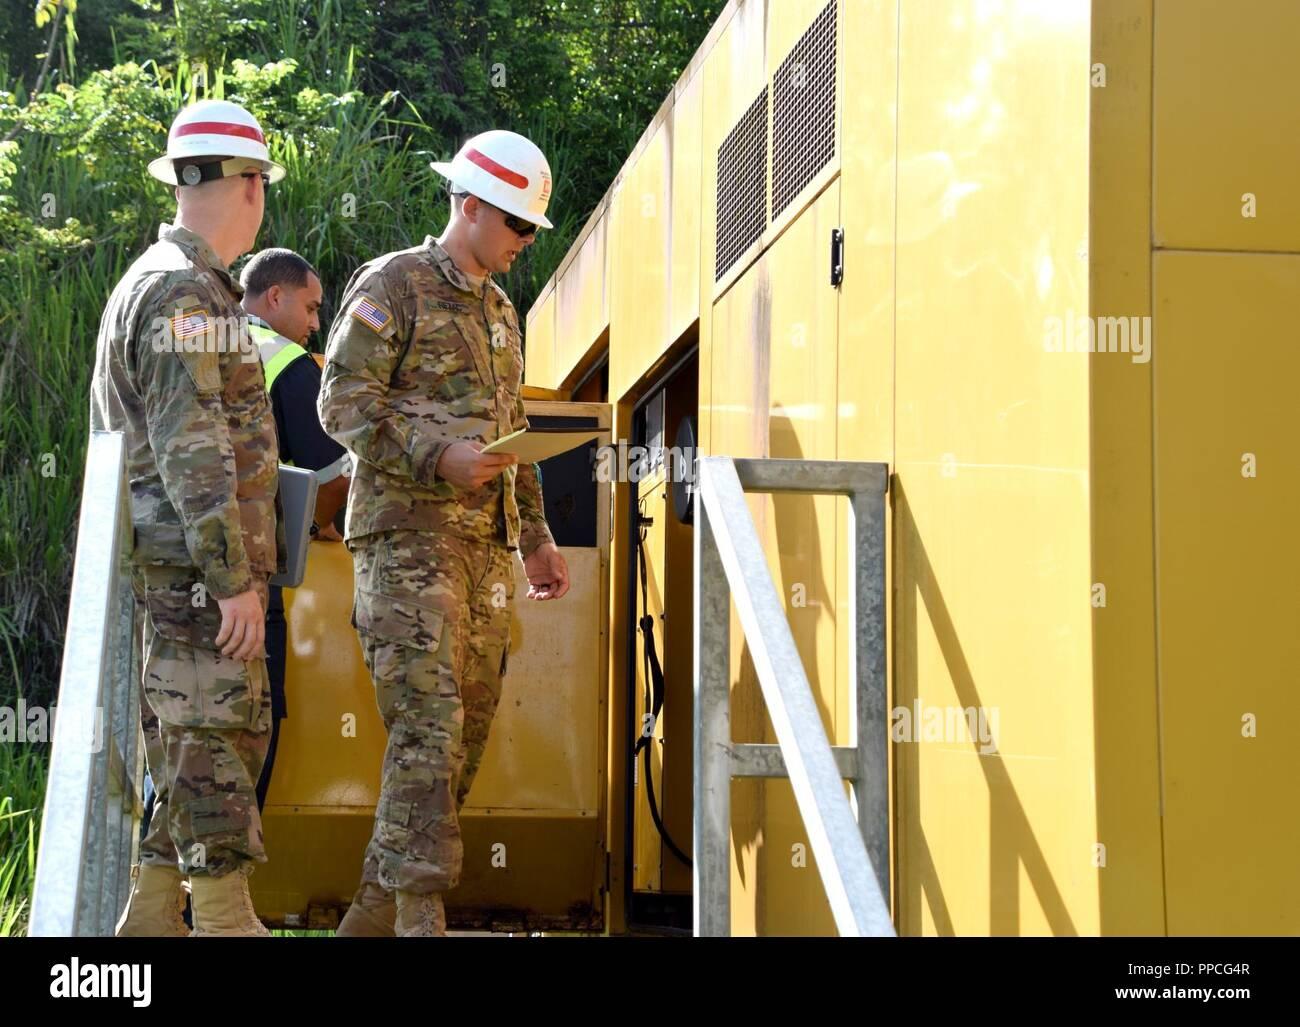 249th Engineer Battalion Stock Photos & 249th Engineer Battalion